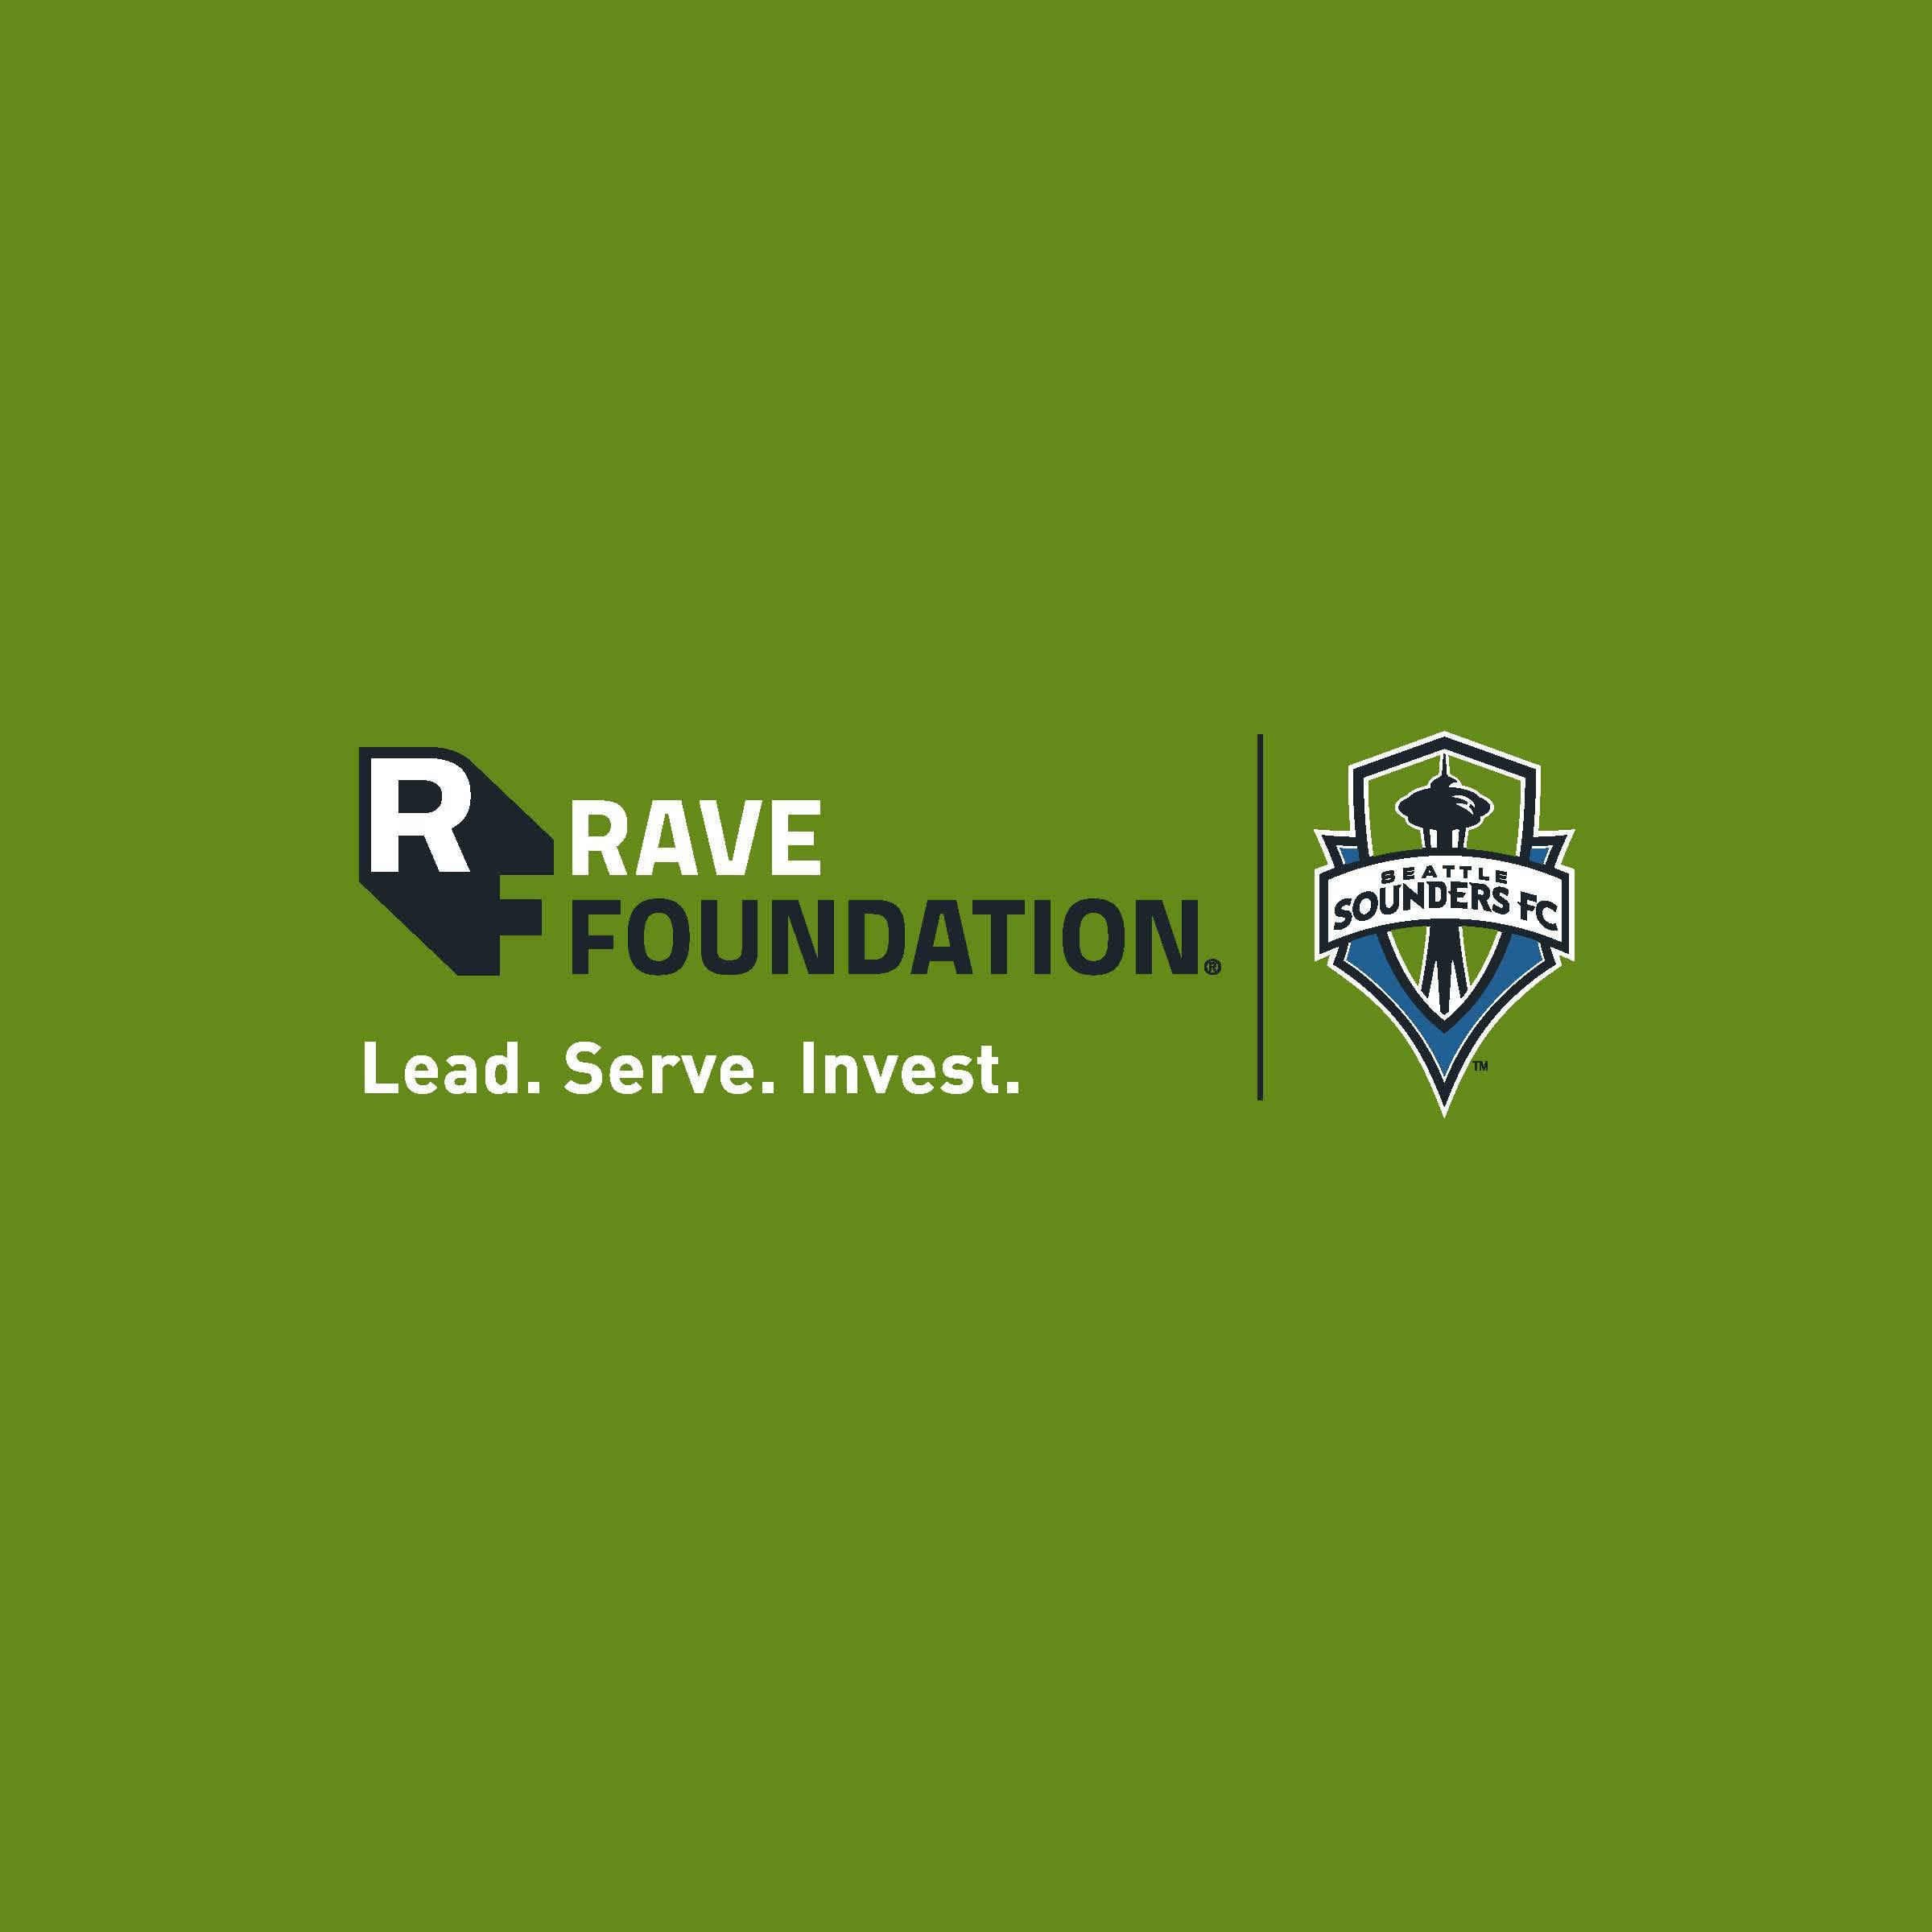 RaveFoundation_LogoLockup_withTagline_Page_2.jpg